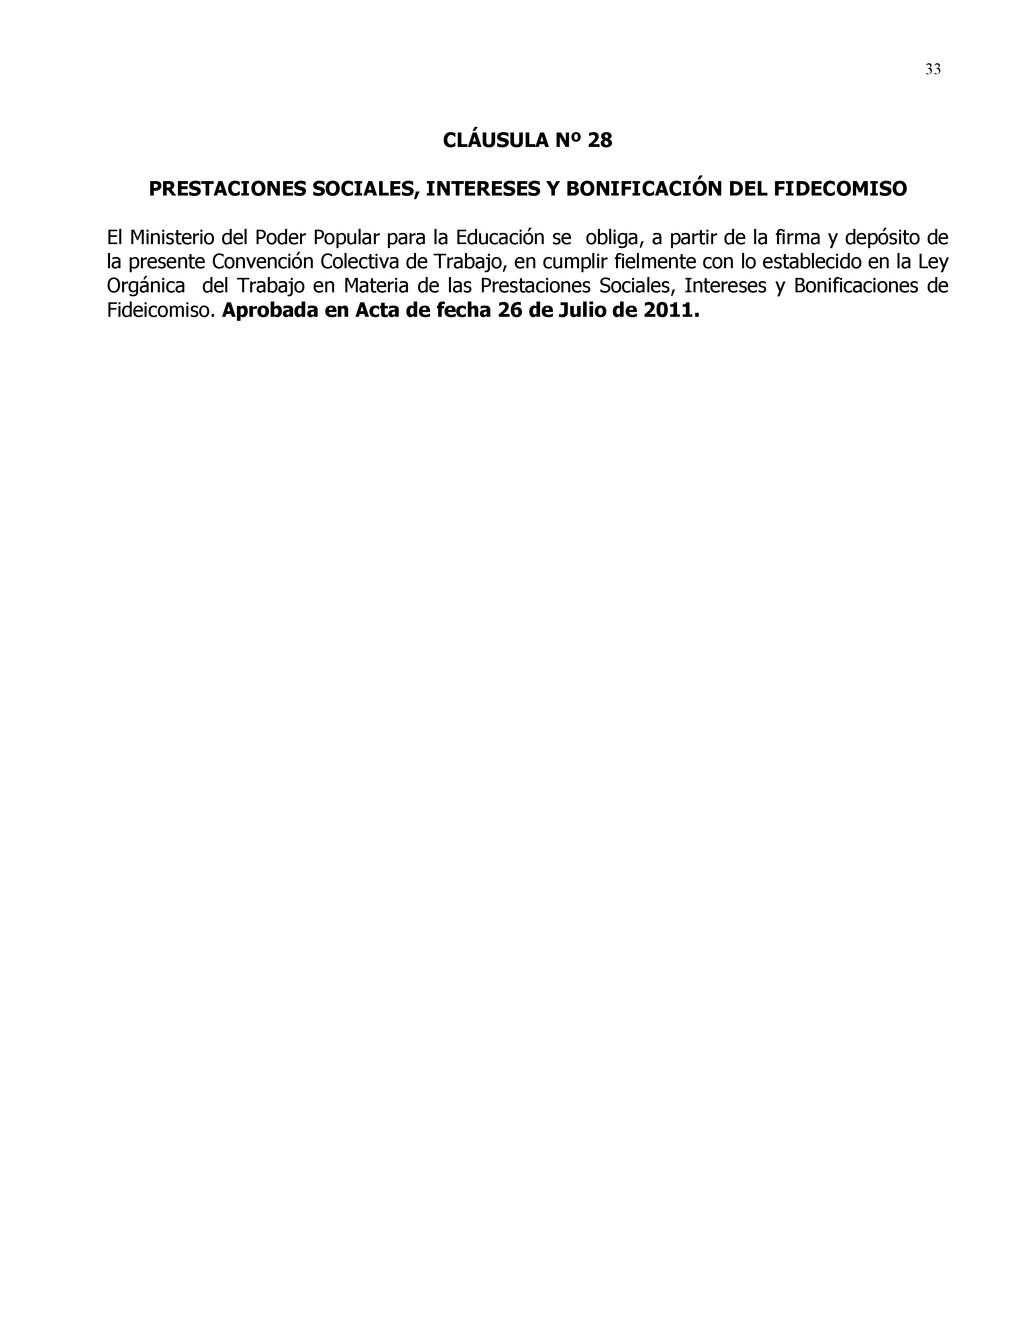 33 CLÁUSULA Nº 28 PRESTACIONES SOCIALES, INTERE...